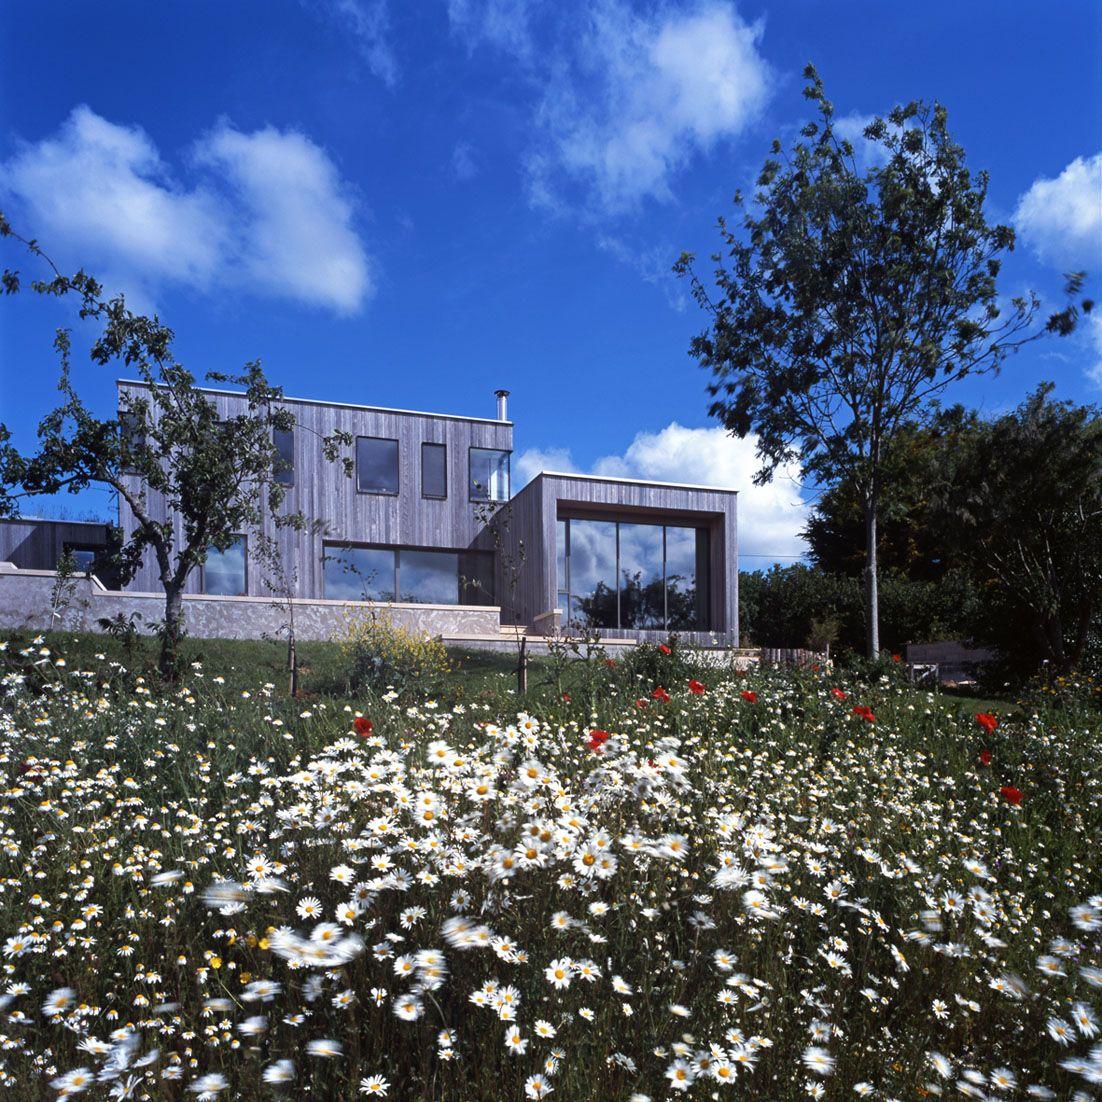 Award Winning Green Home Designs: Award Winning Family Home In The Green Belt Outside Of